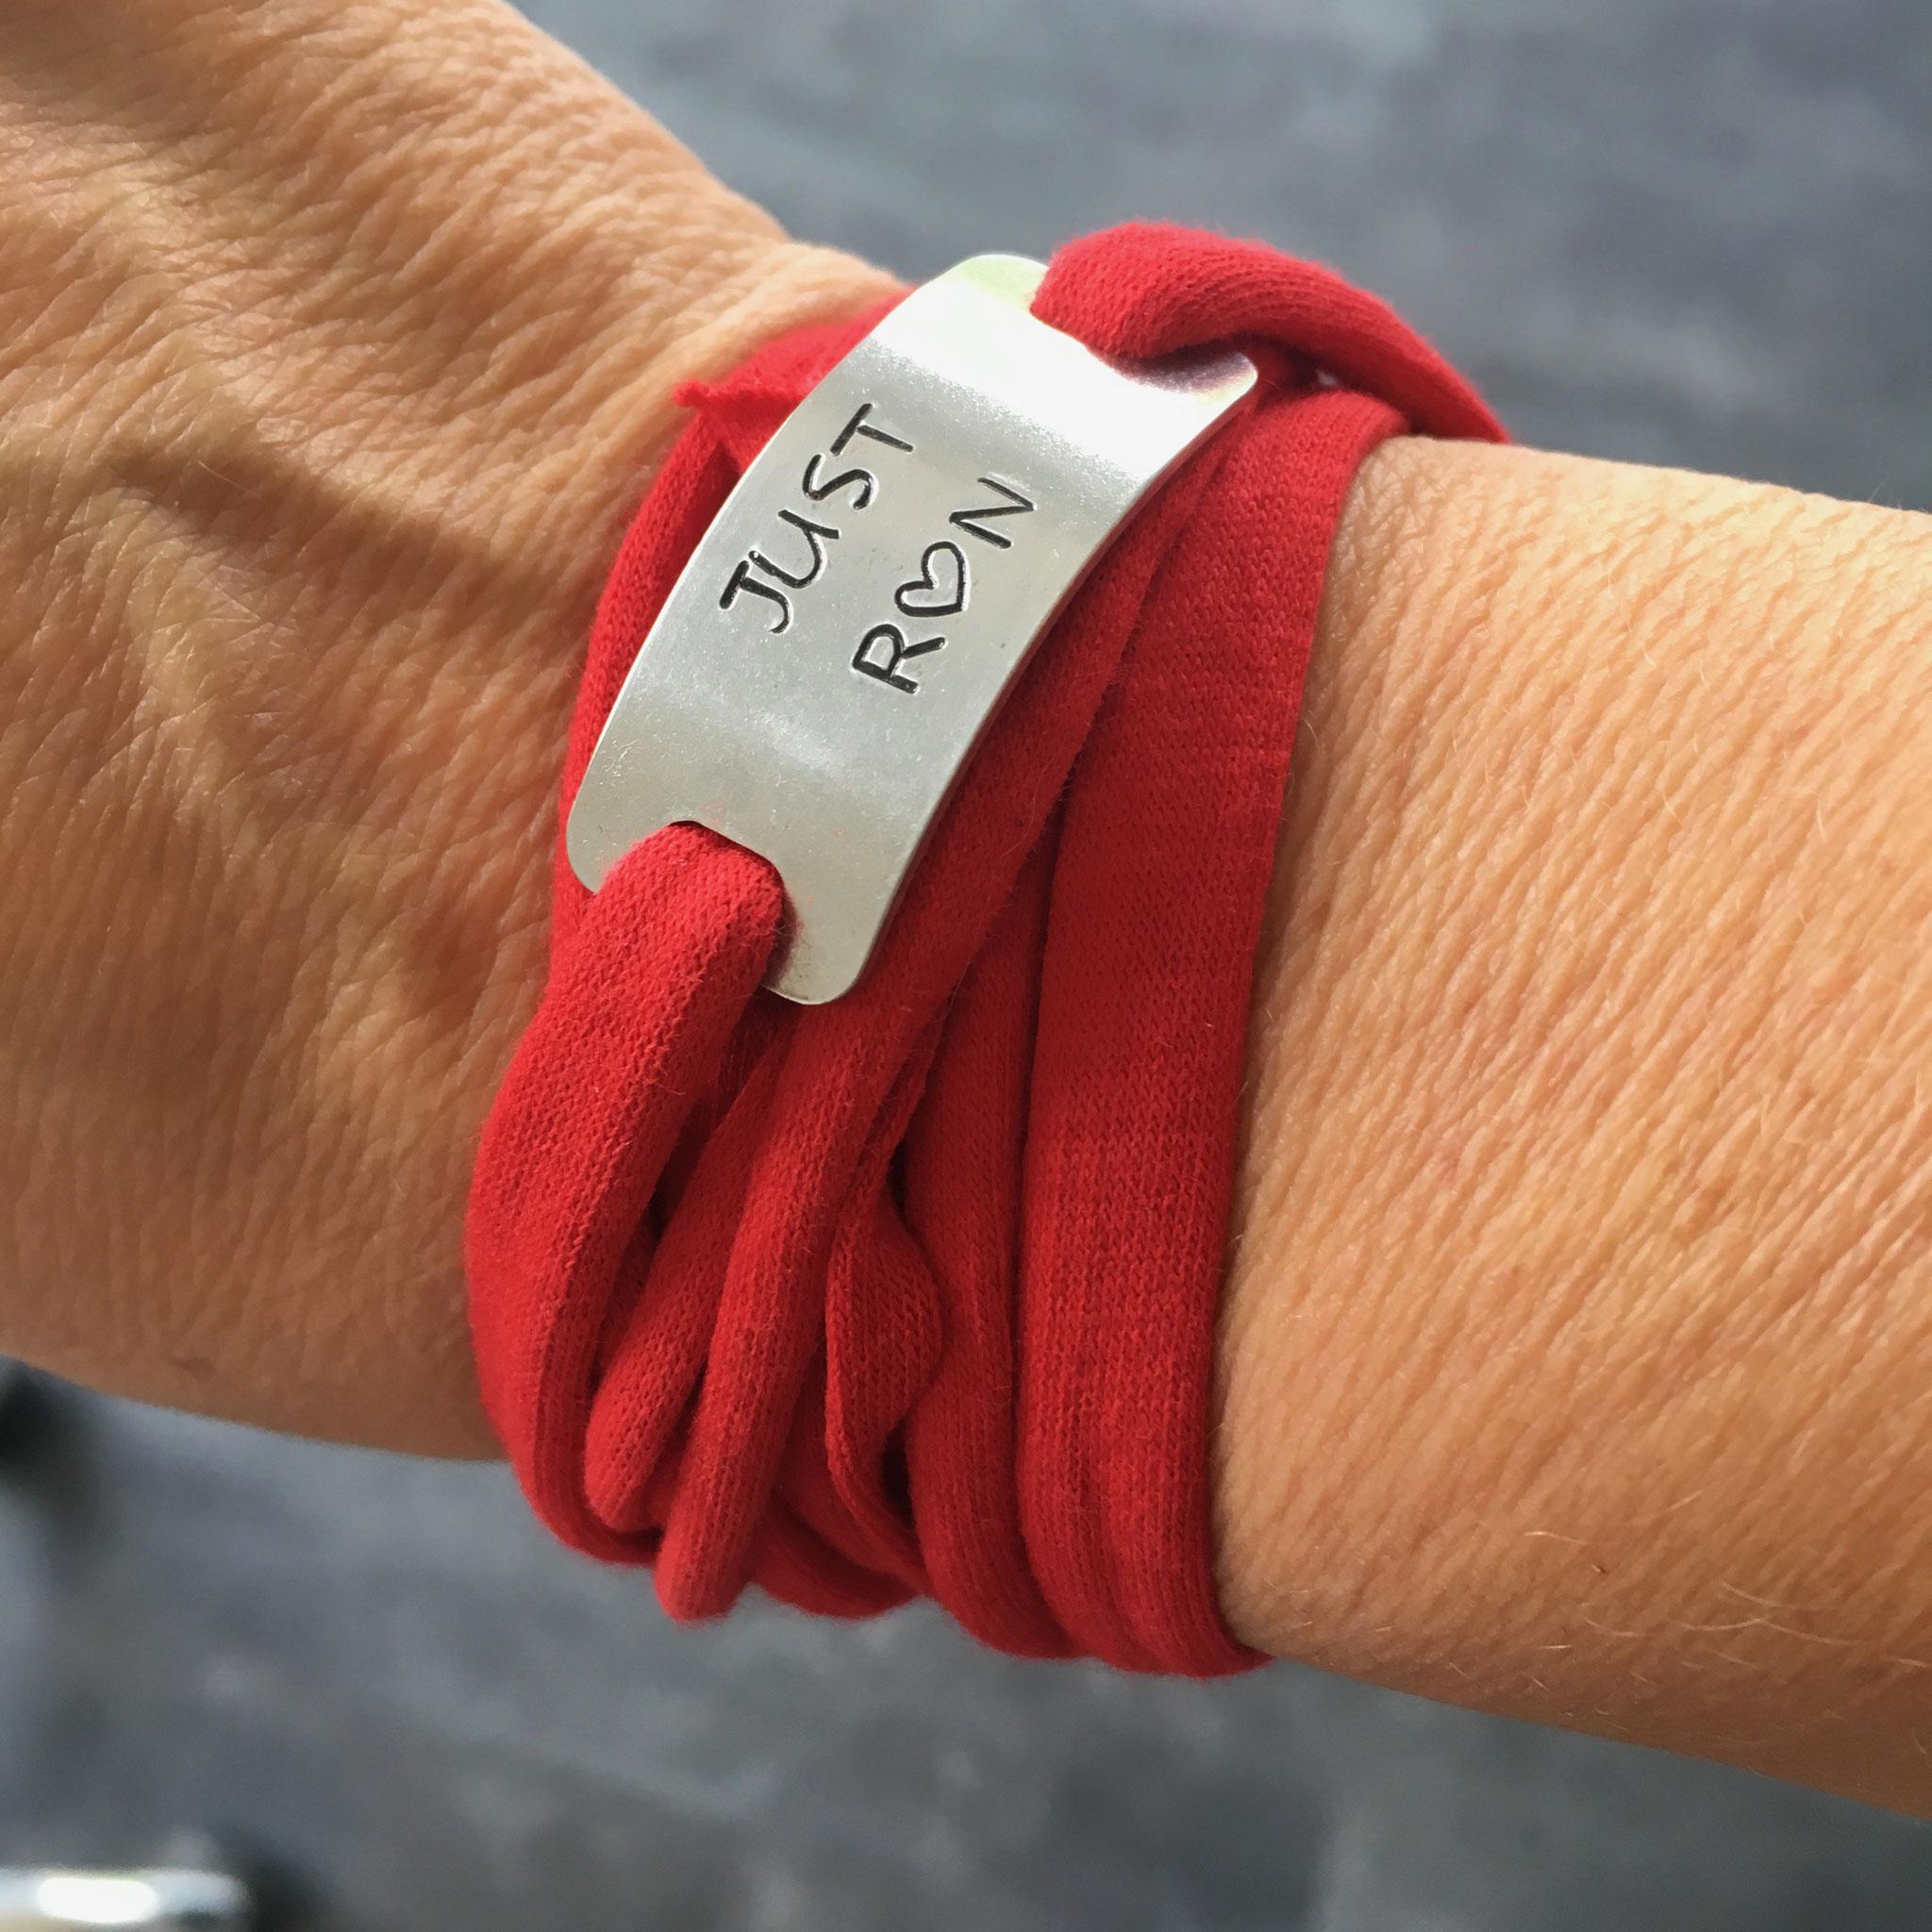 Bracelet bijoux sport plaque métal gravée poinçonnée motivation running marathon fait main made in France just run